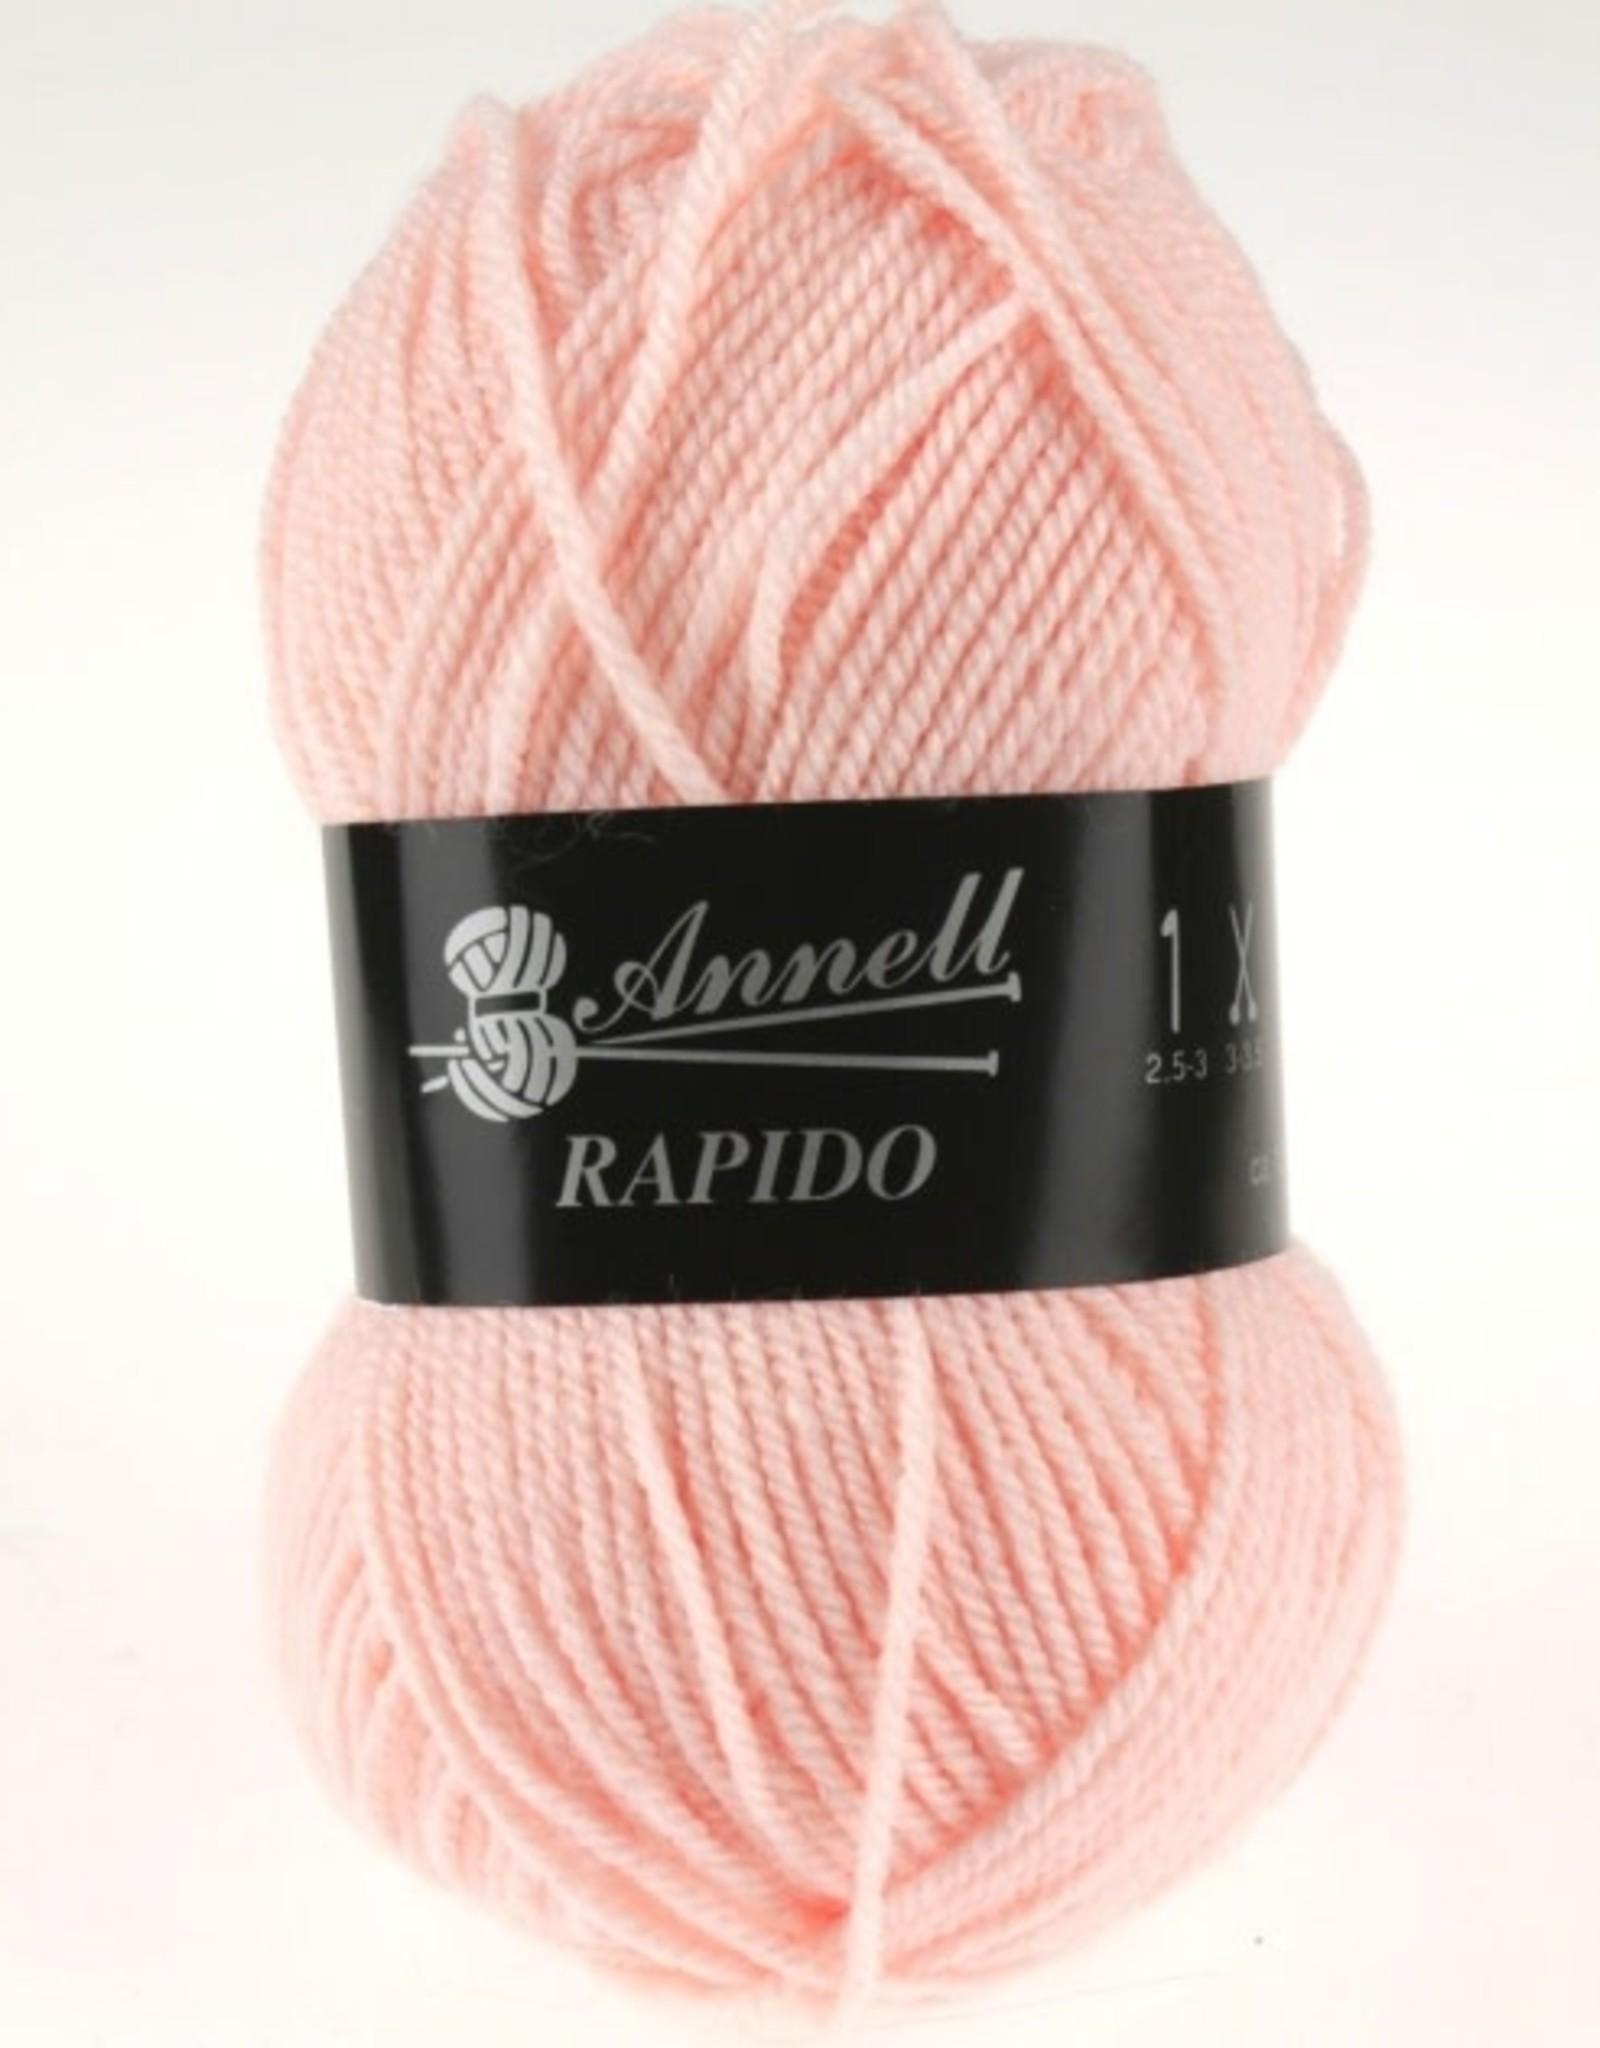 Annell Annell rapido 3232